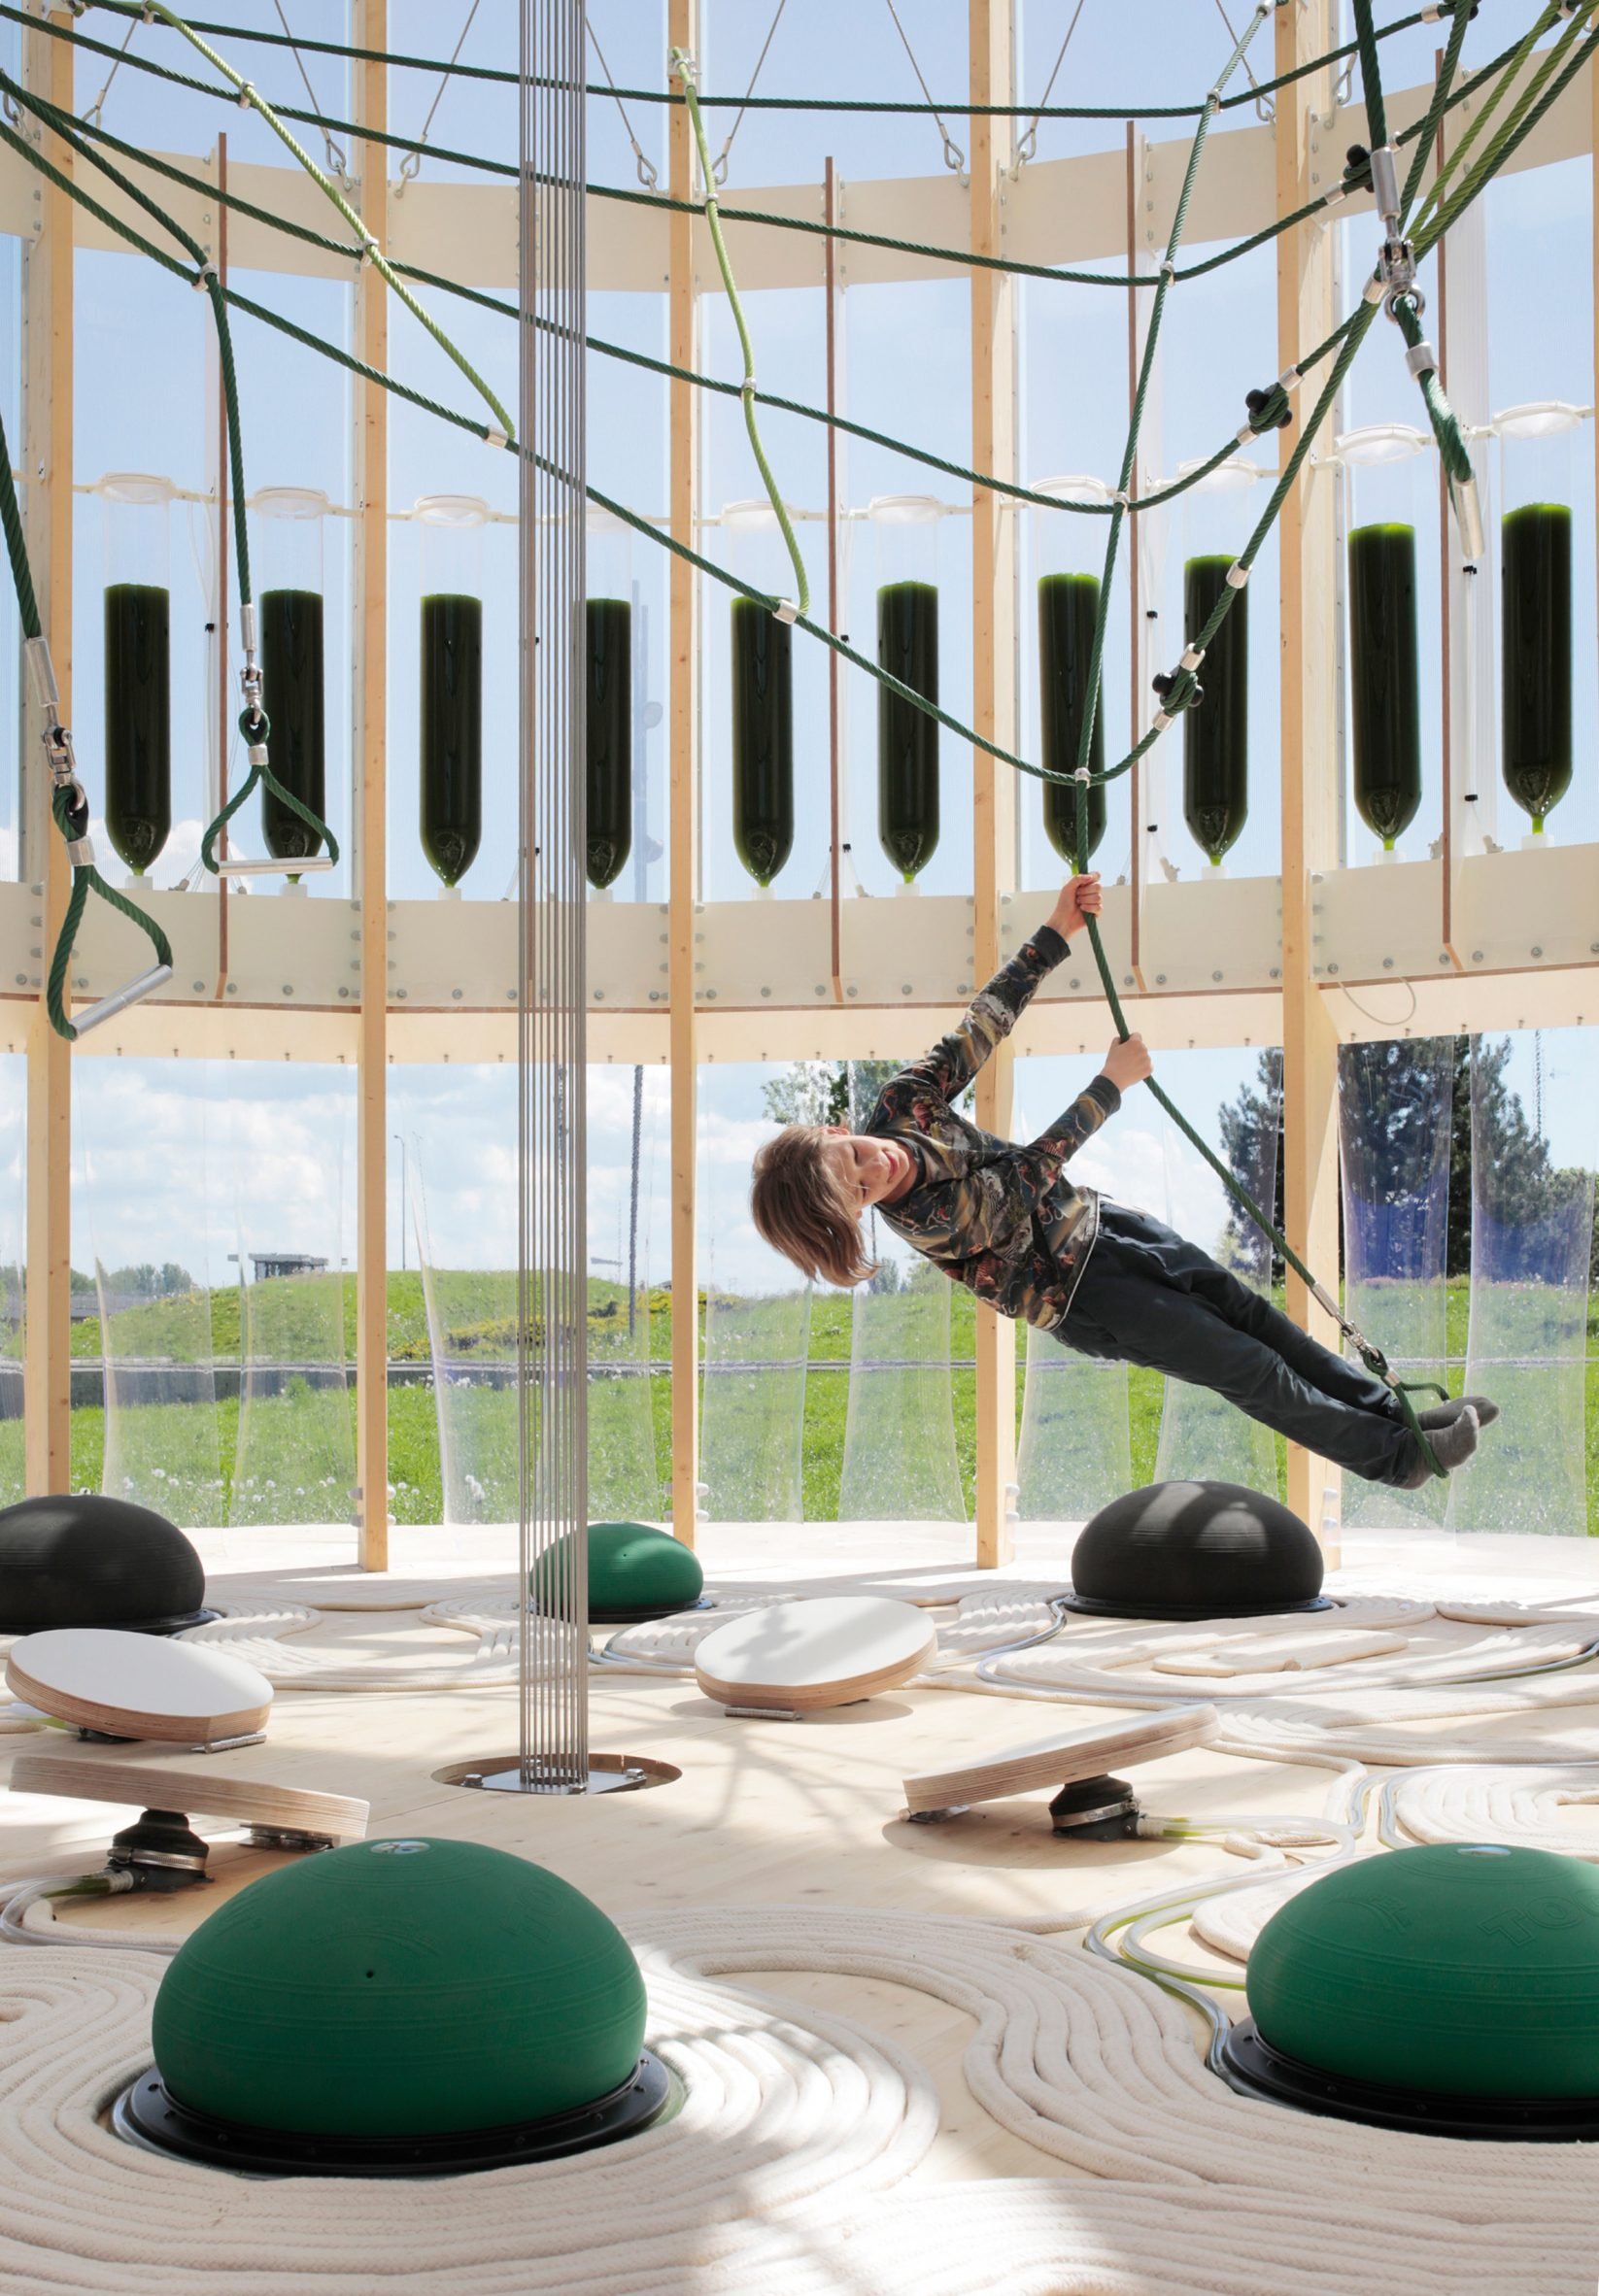 Child swinging on ropes inside the bioreactor playground